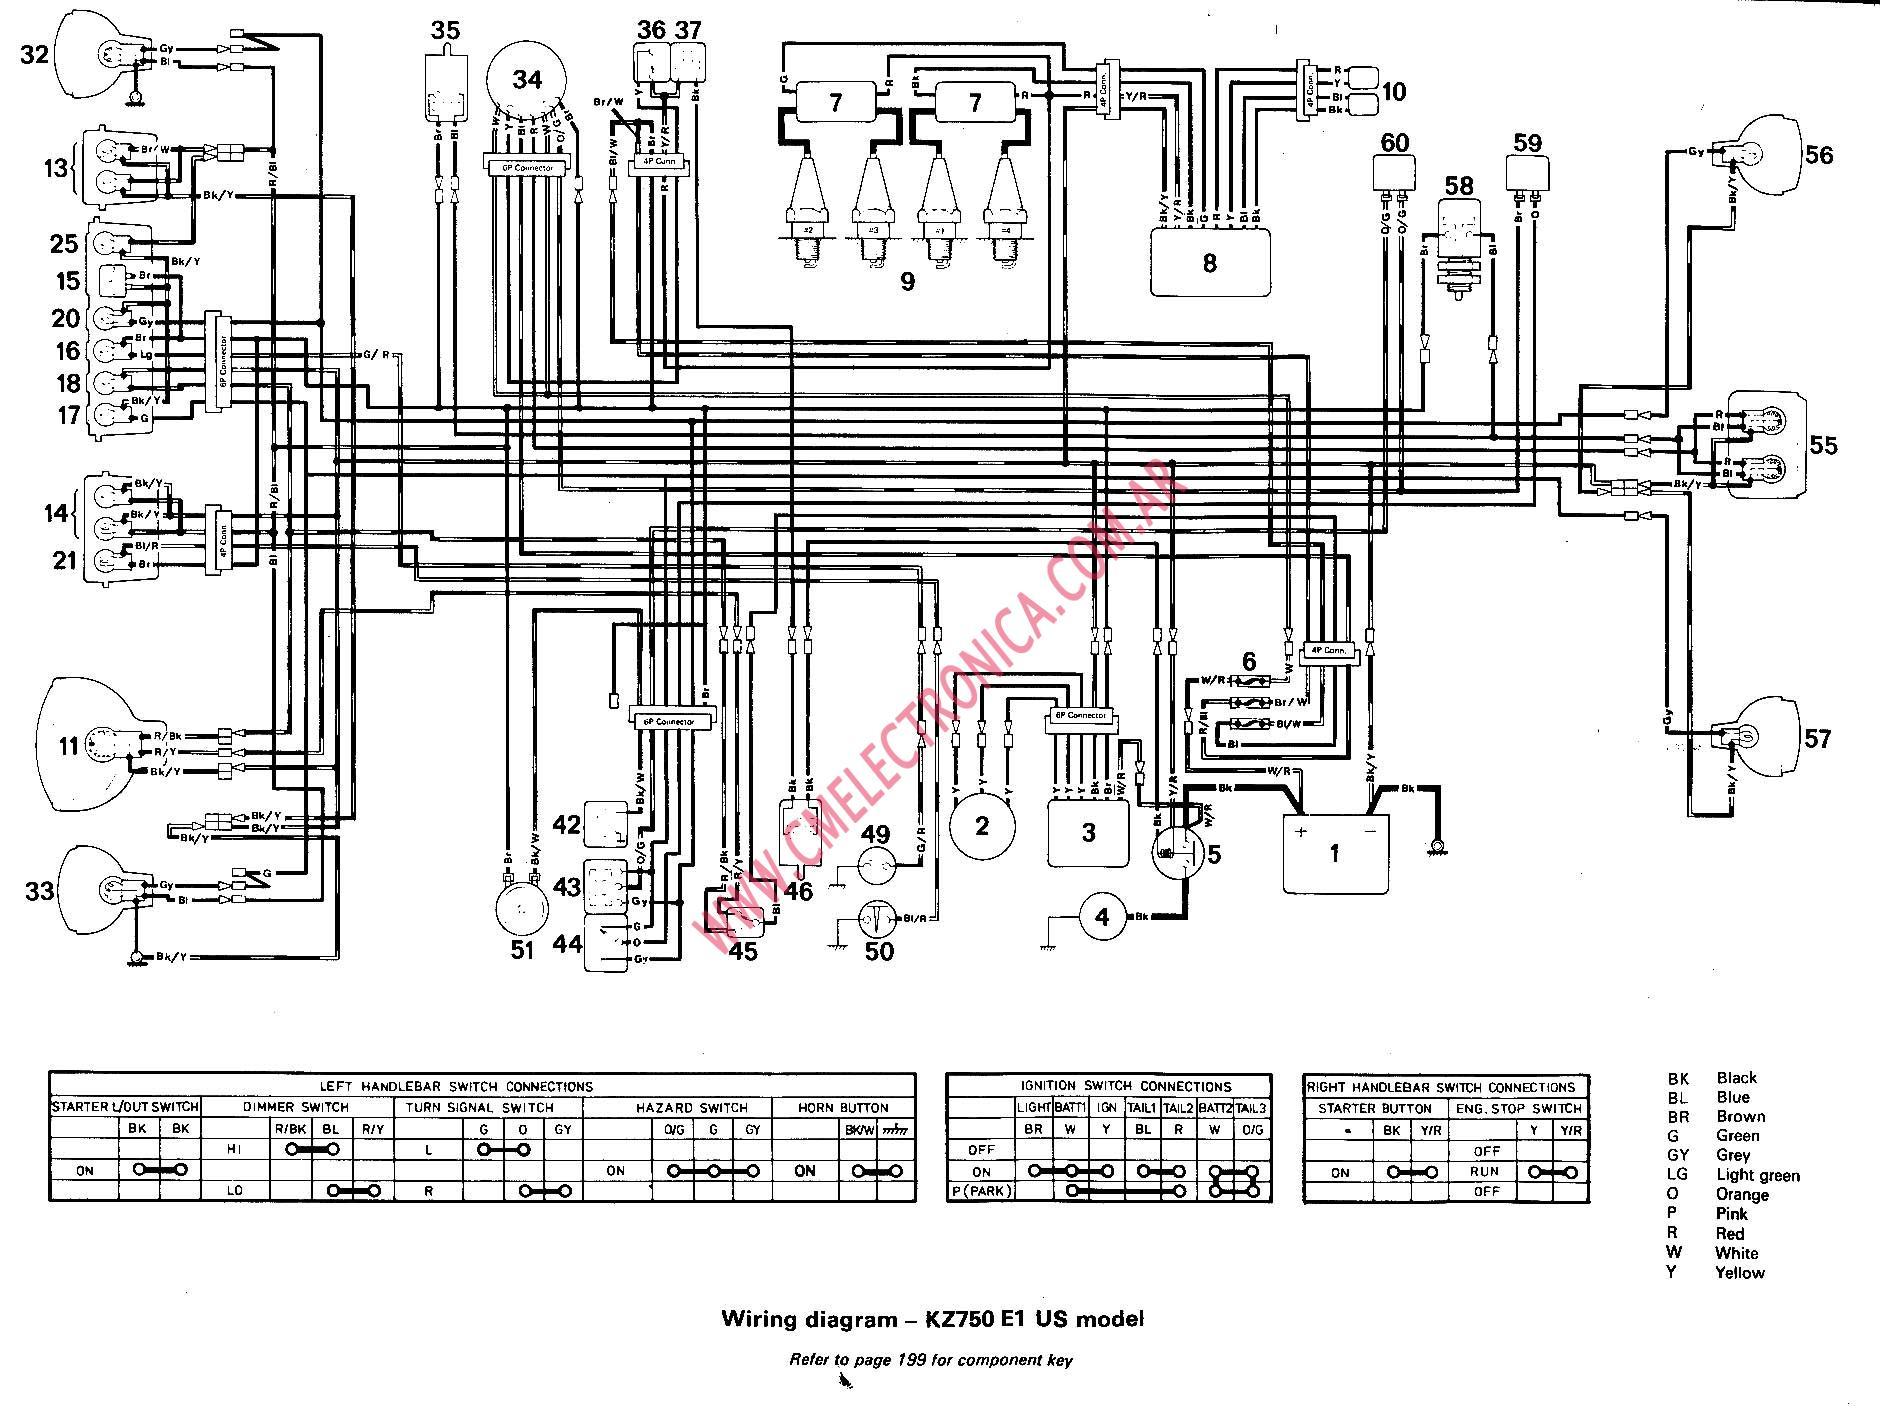 1987 454 kawasaki Diagrama del motor